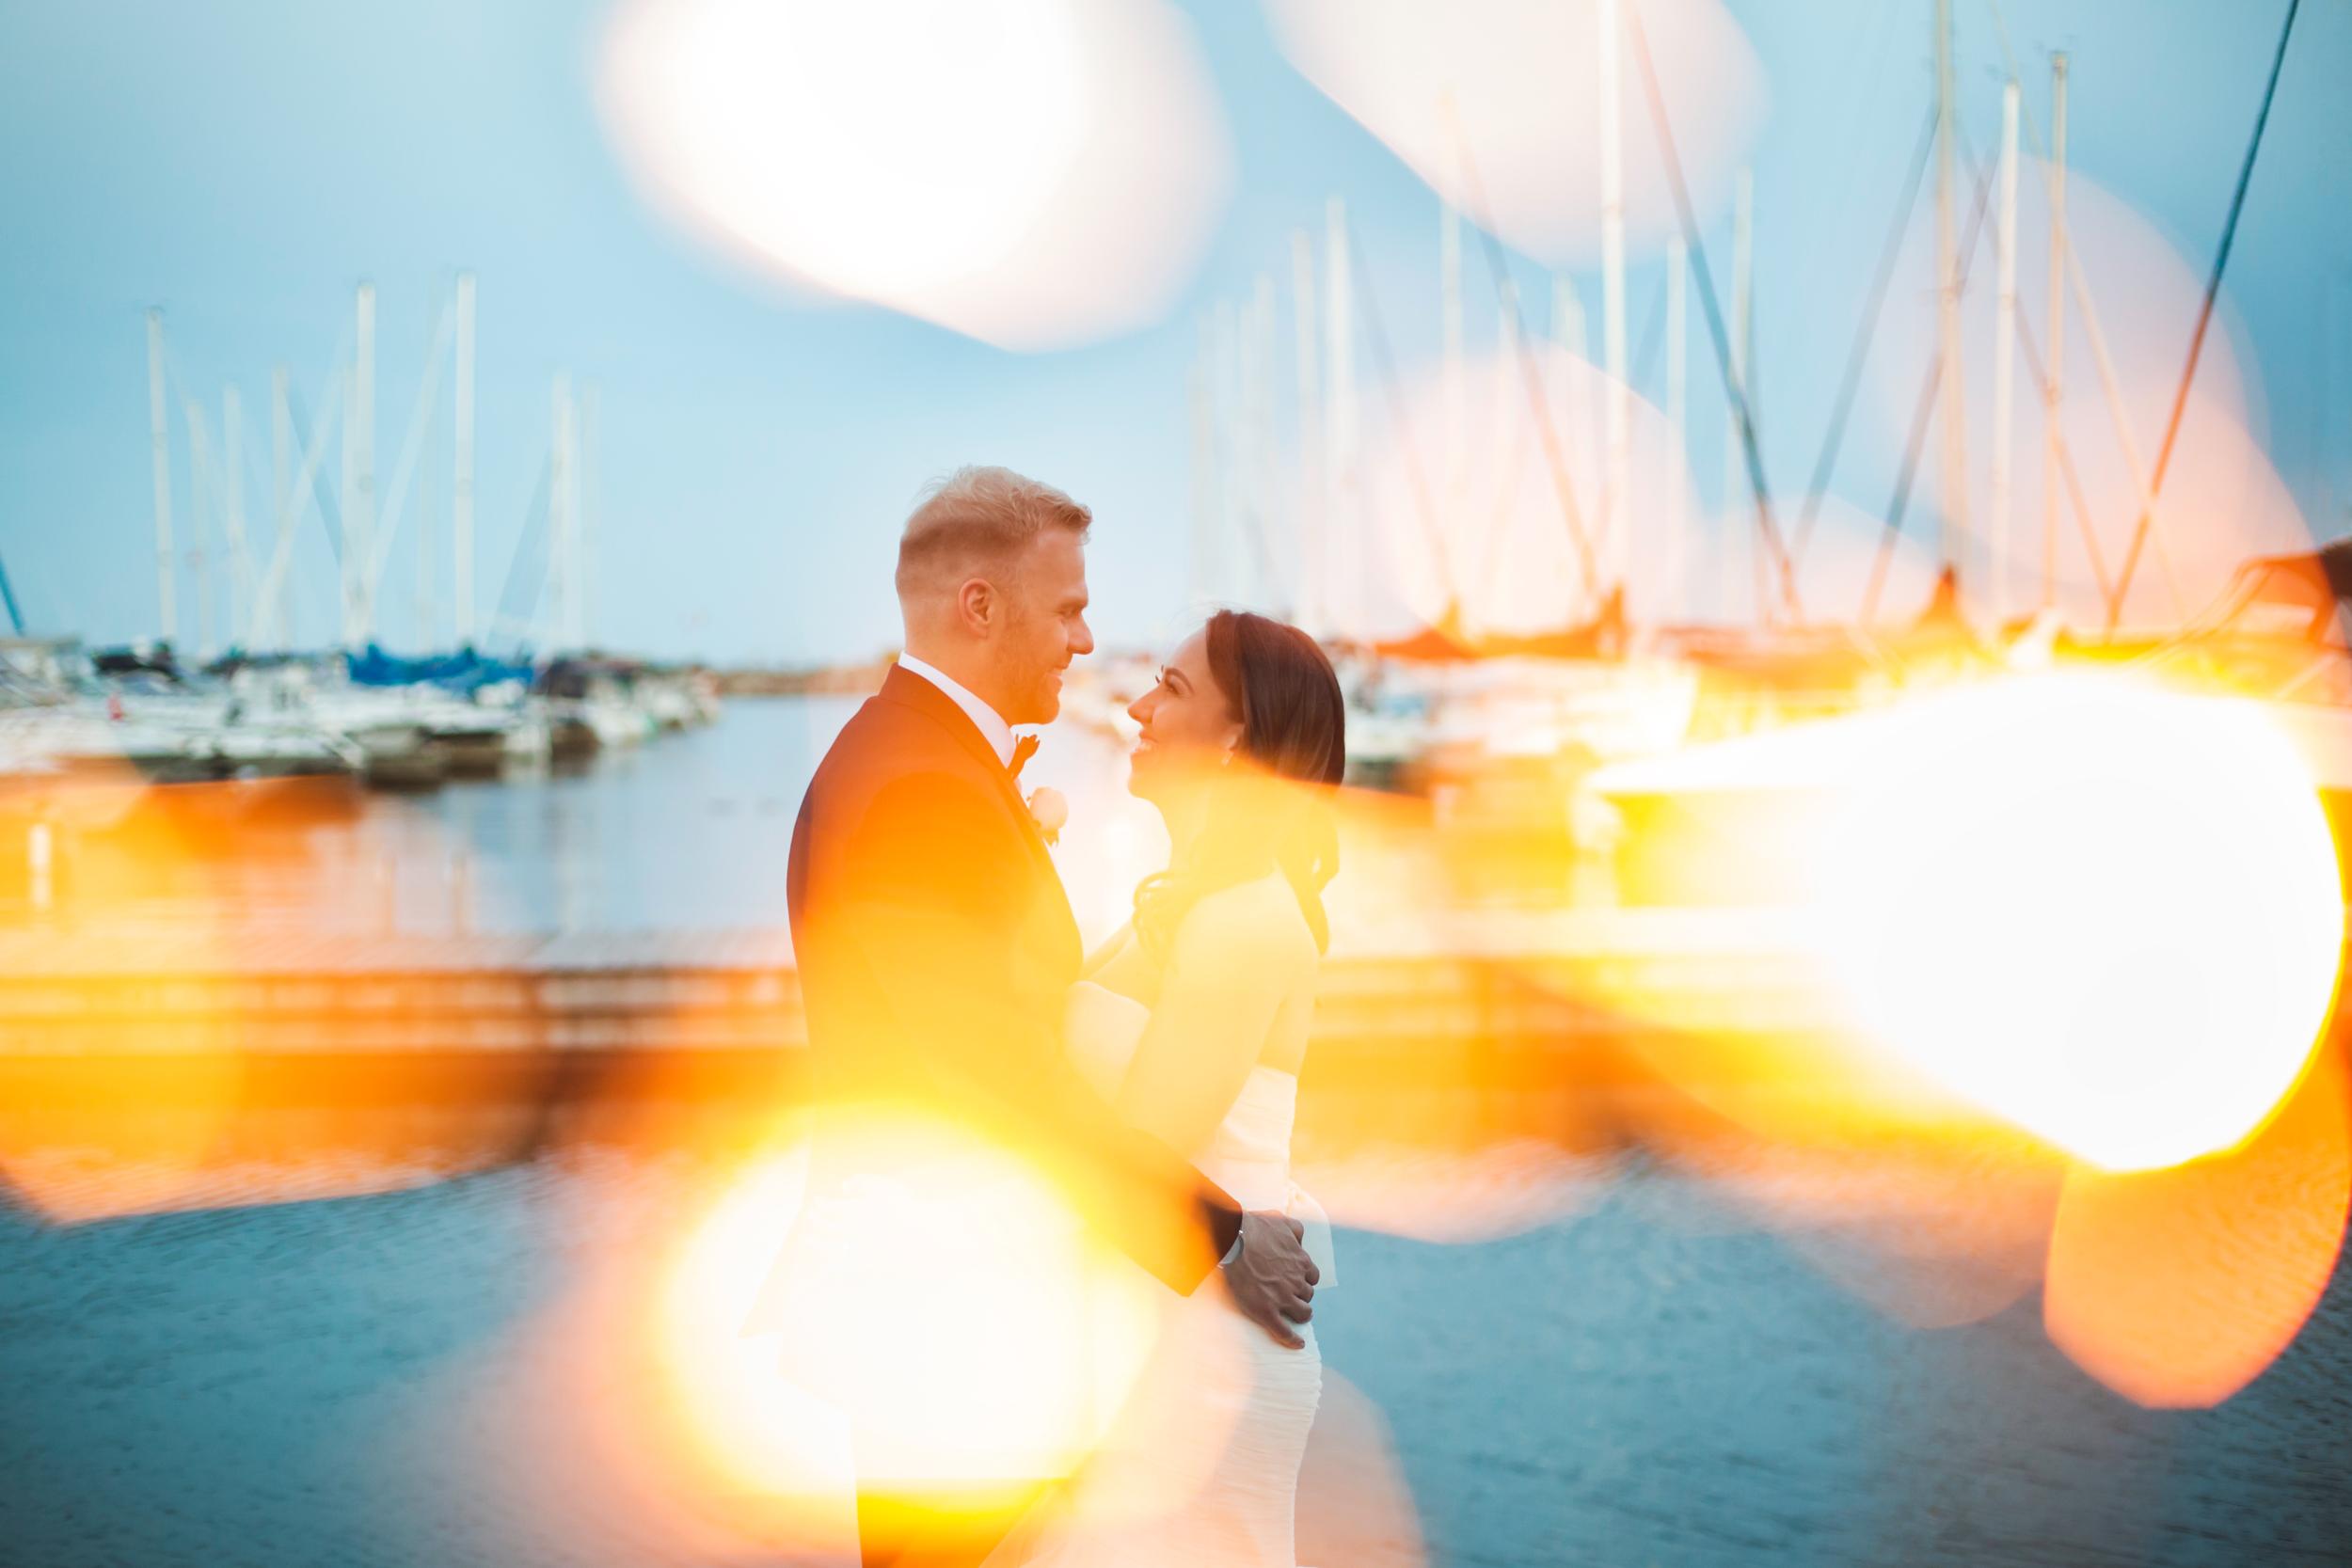 Wedding-Harbour-Banquet-Center-Oakville-Photographer-Wedding-Hamilton-Saint-James-Espresso-Downtown-HamOnt-GTA-Niagara-Toronto-Moments-by-Lauren-Photography-Photo-Image-82.png